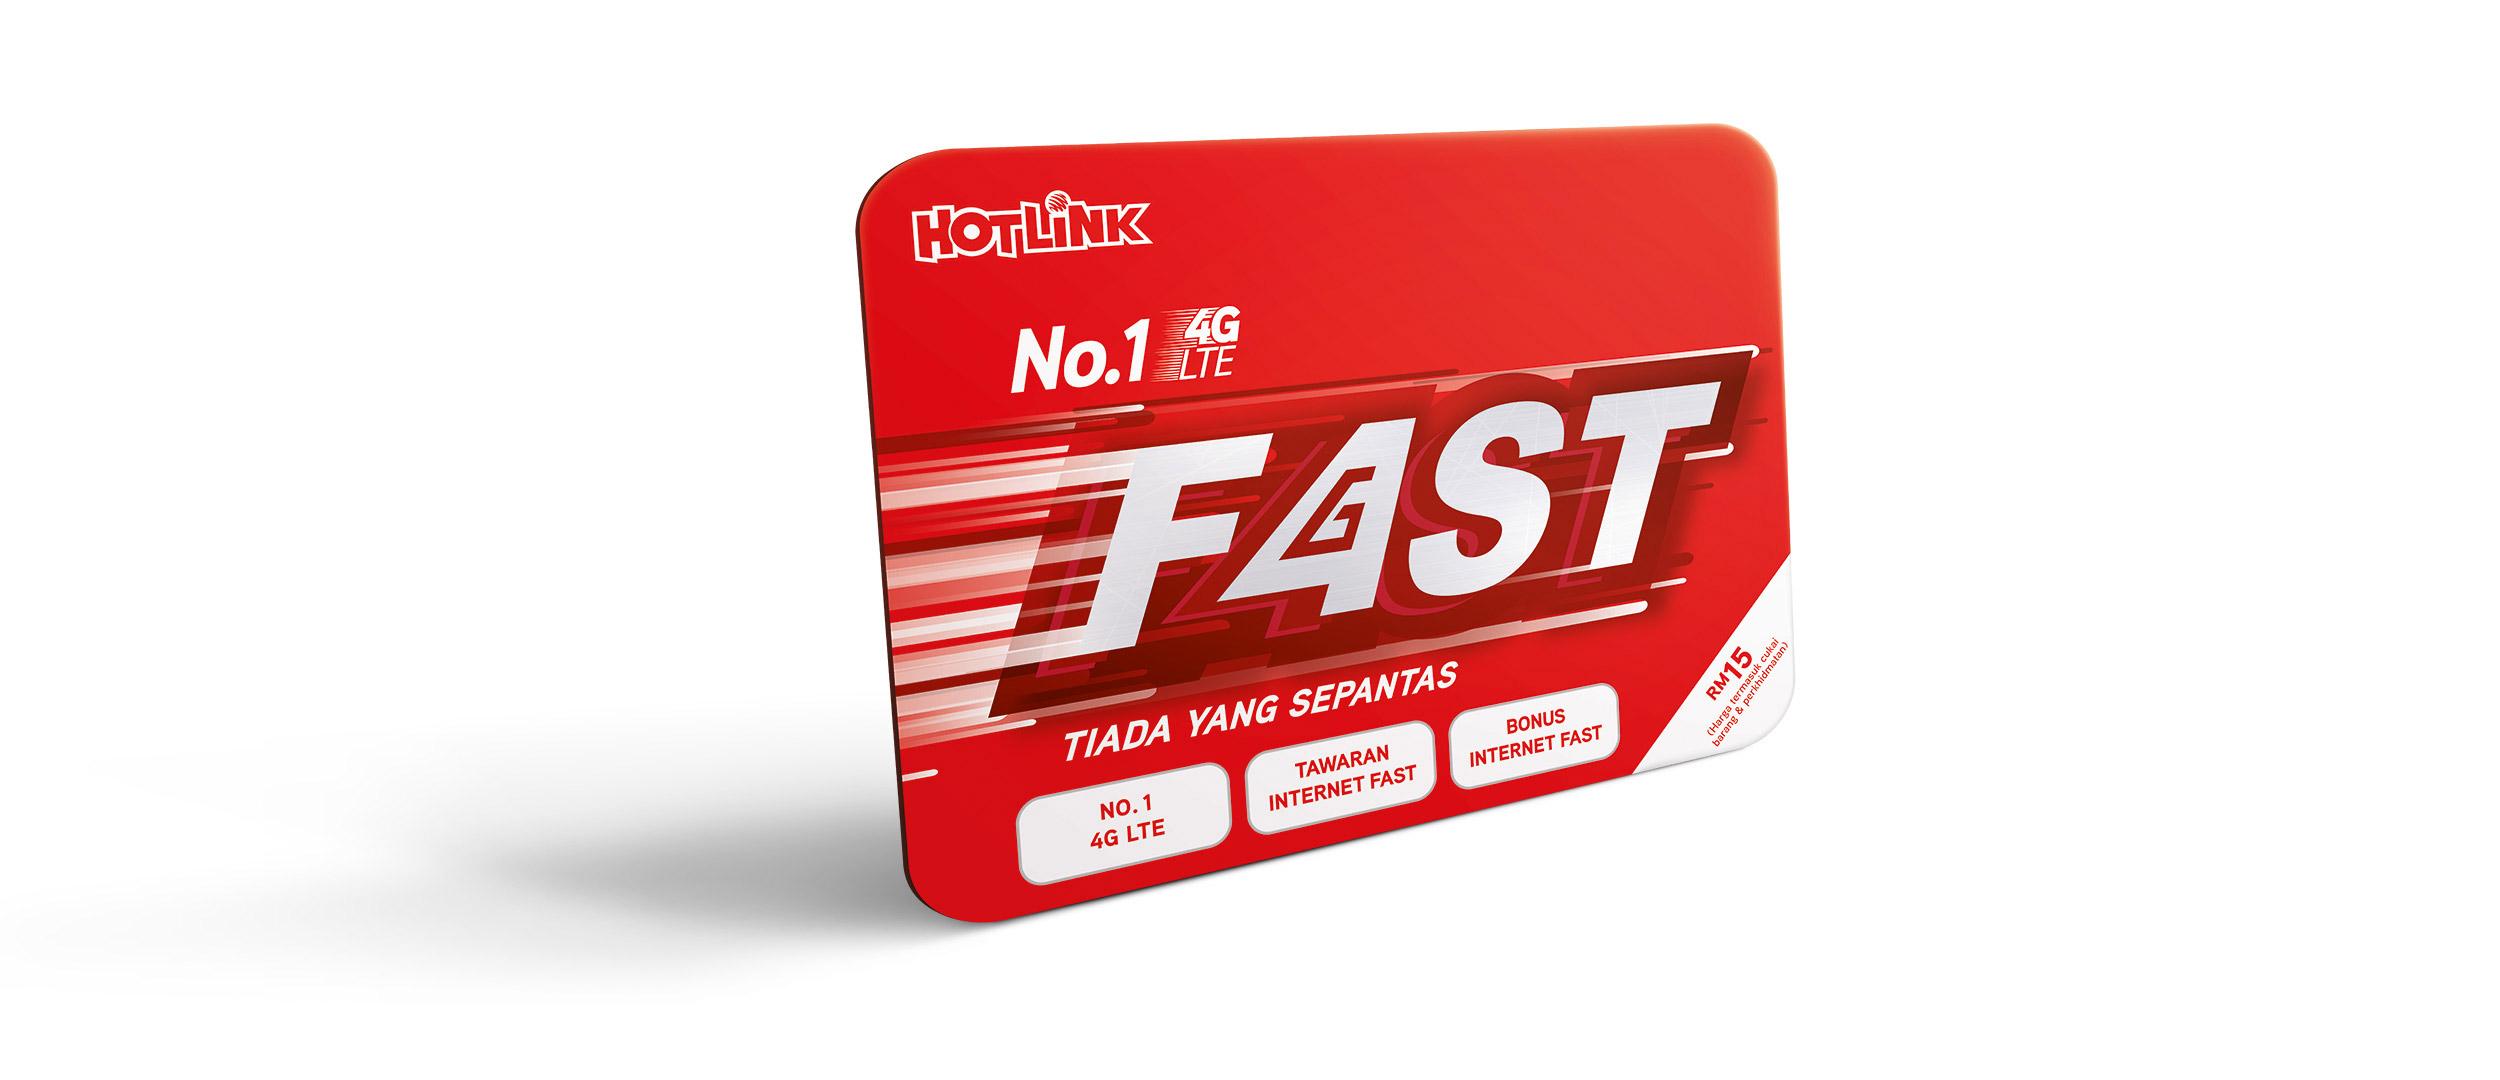 Hotlink No.1 4G LTE FAST